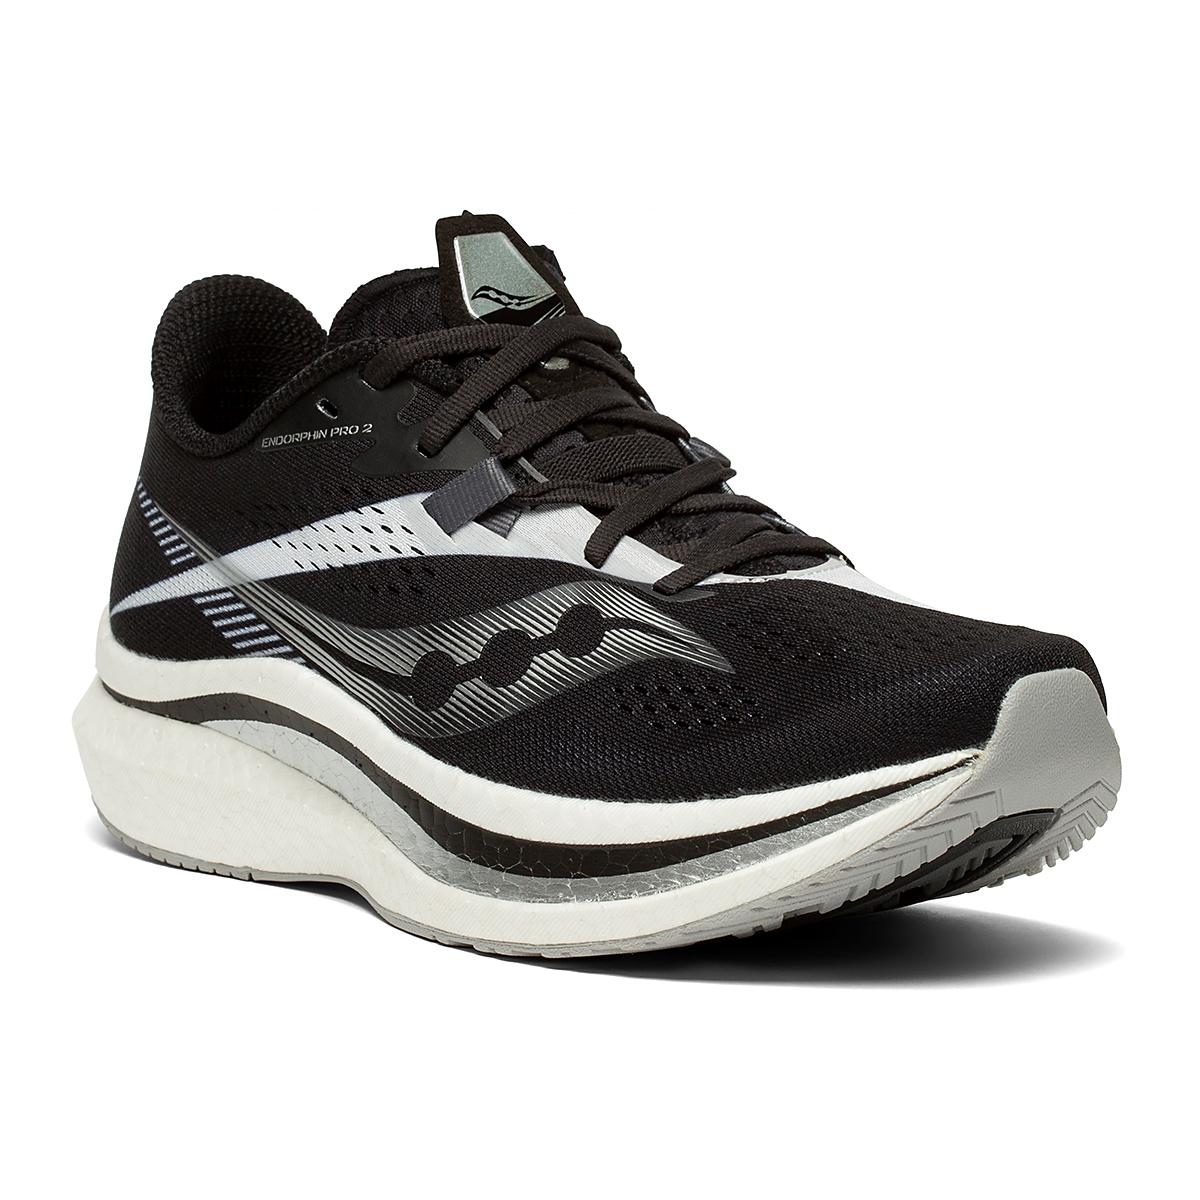 Women's Saucony Endorphin Pro 2 Running Shoe - Color: Black/White - Size: 5 - Width: Regular, Black/White, large, image 5